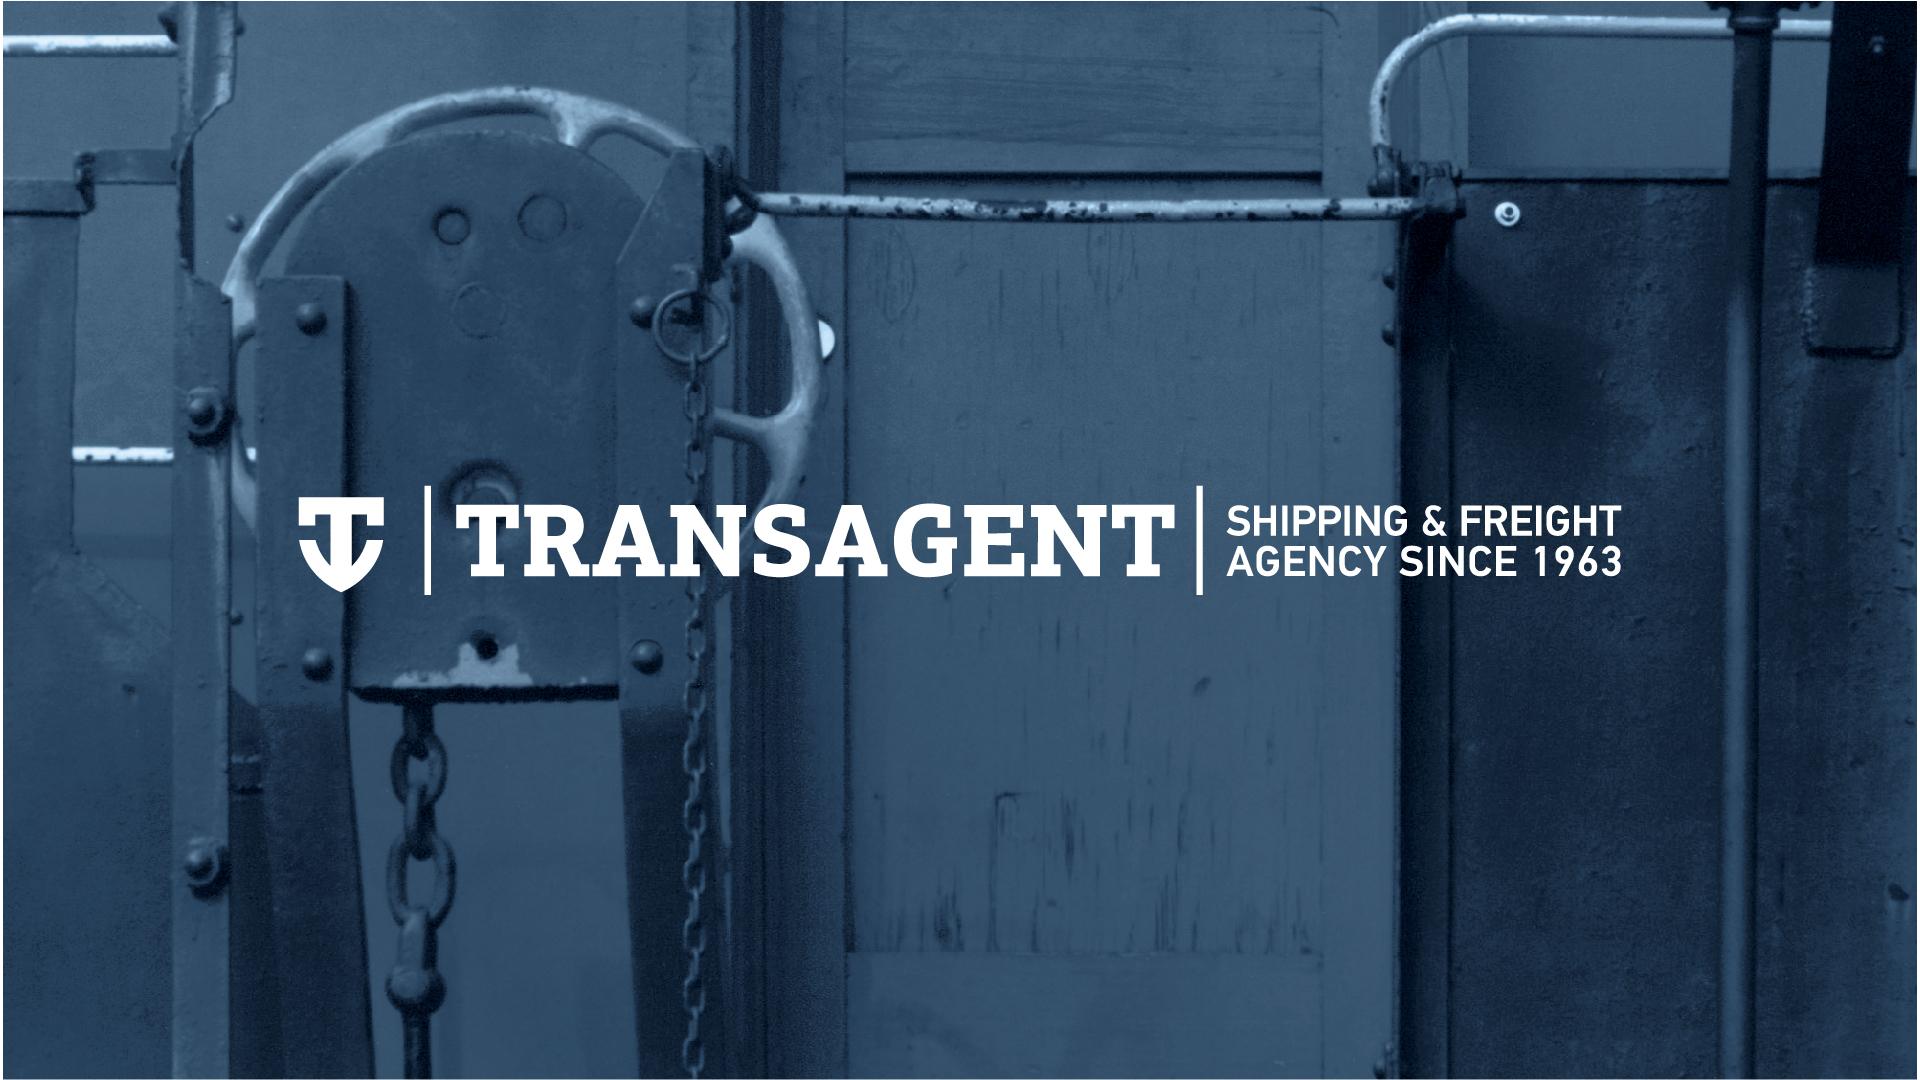 05_Transagent